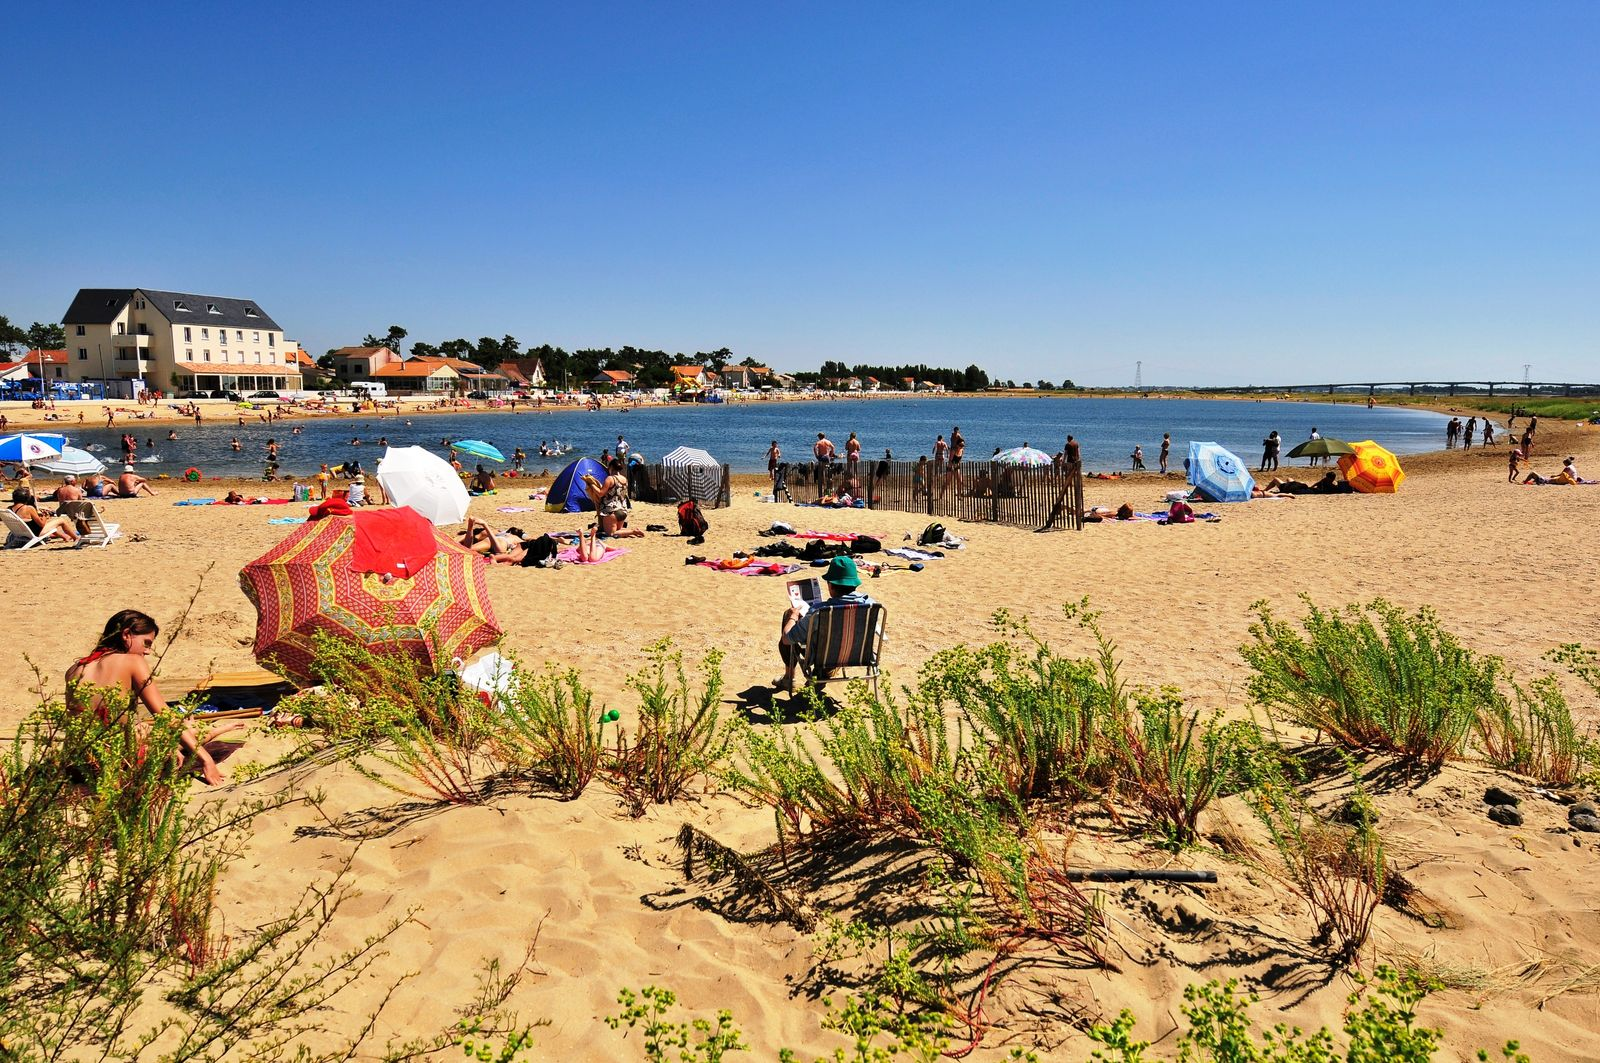 Afbeelding van Domaine les Marées - 8. Le Nid des Cigognes - vakantiehuizen in Frankrijk